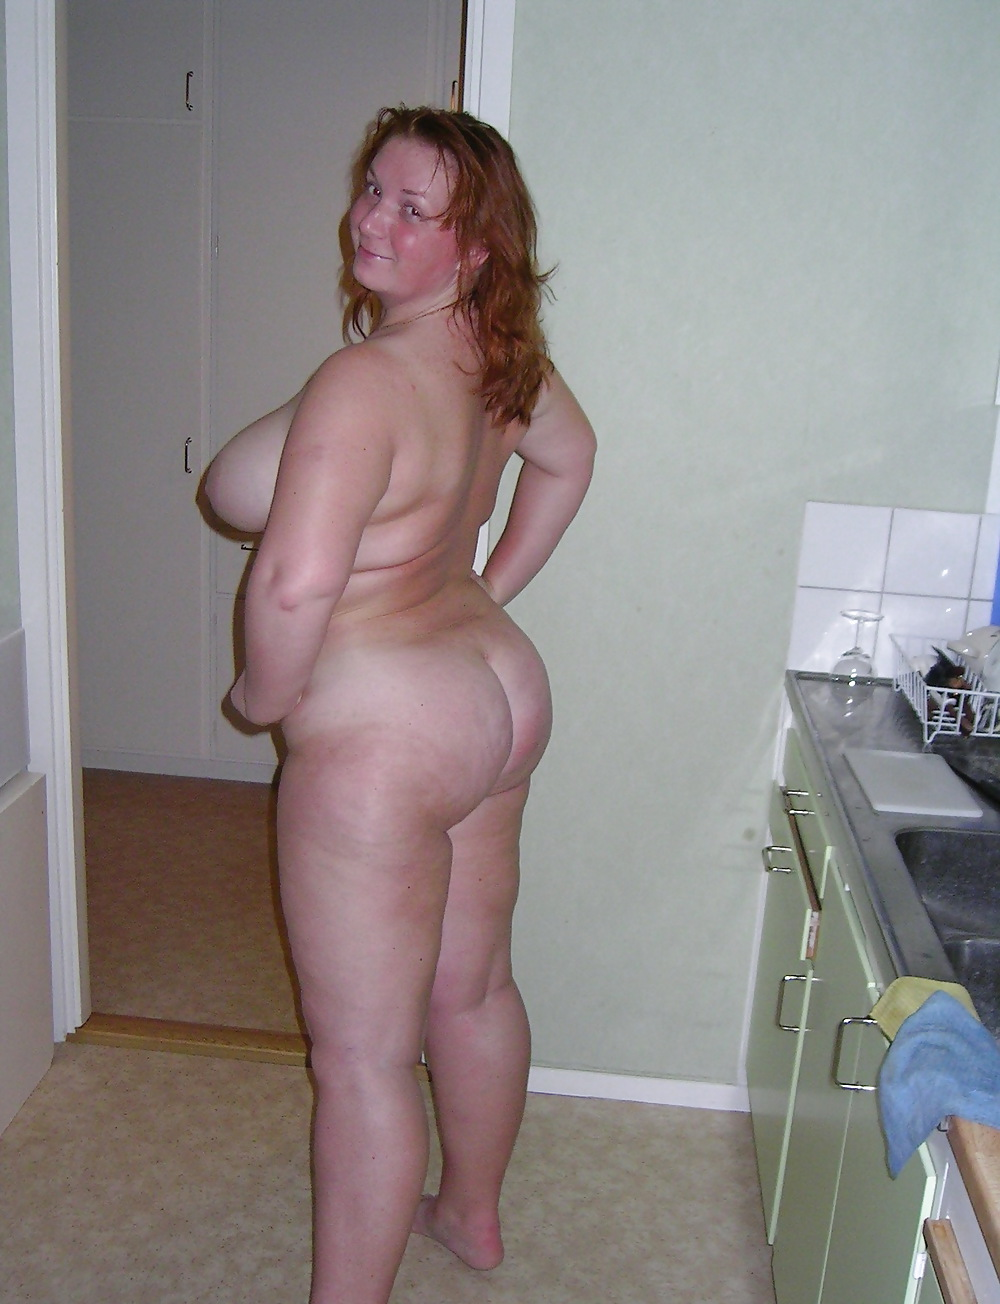 Short chubby milf, naked adult models